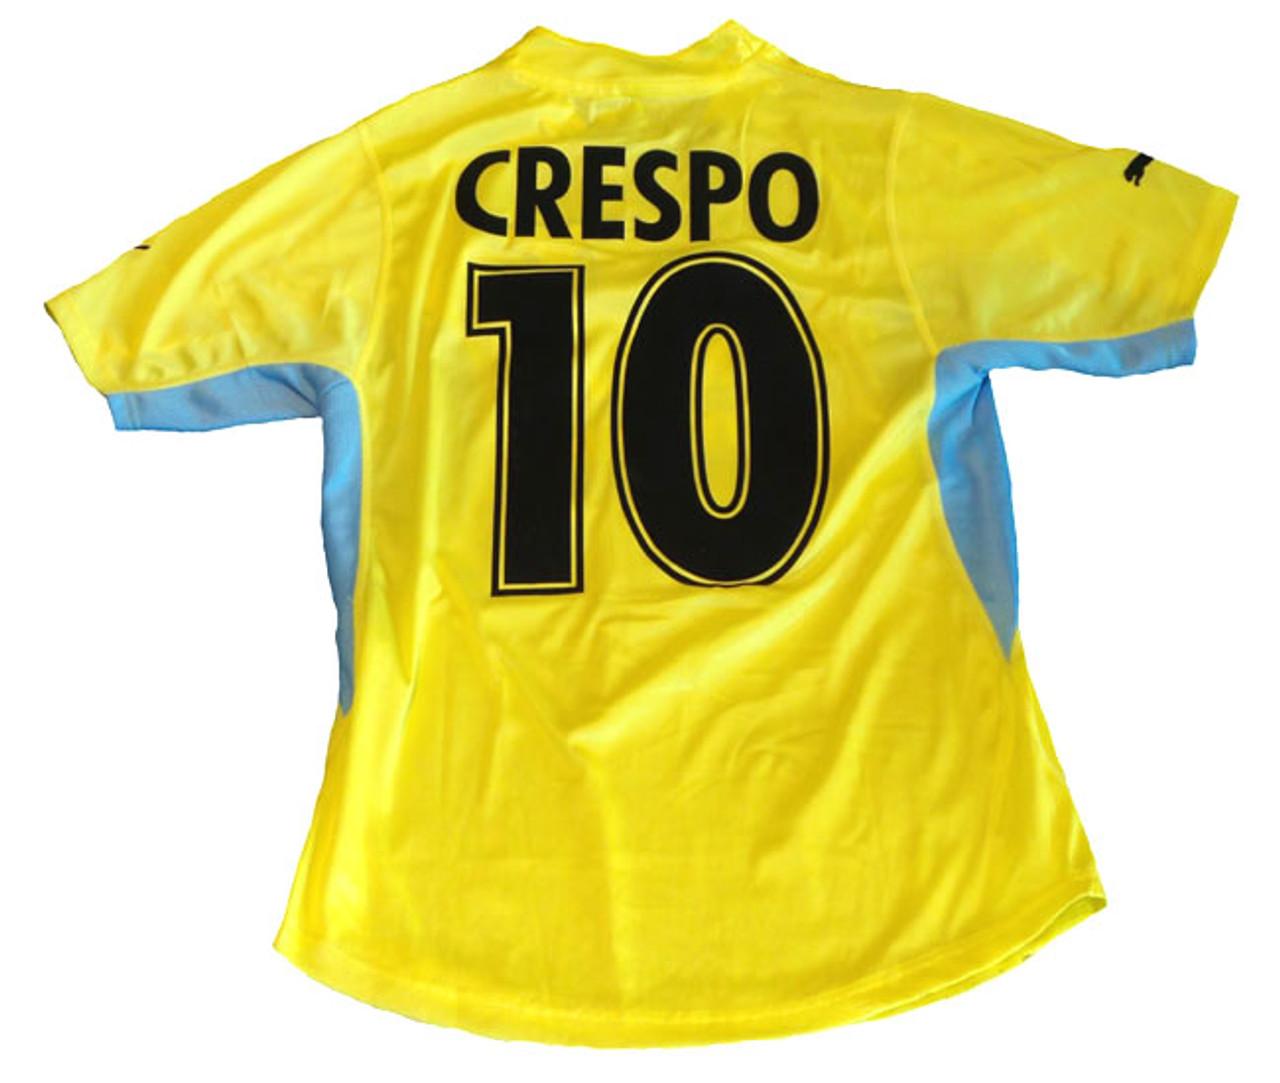 PUMA LAZIO 2002 AWAY `CRESPO` YELLOW JERSEY - Soccer Plus